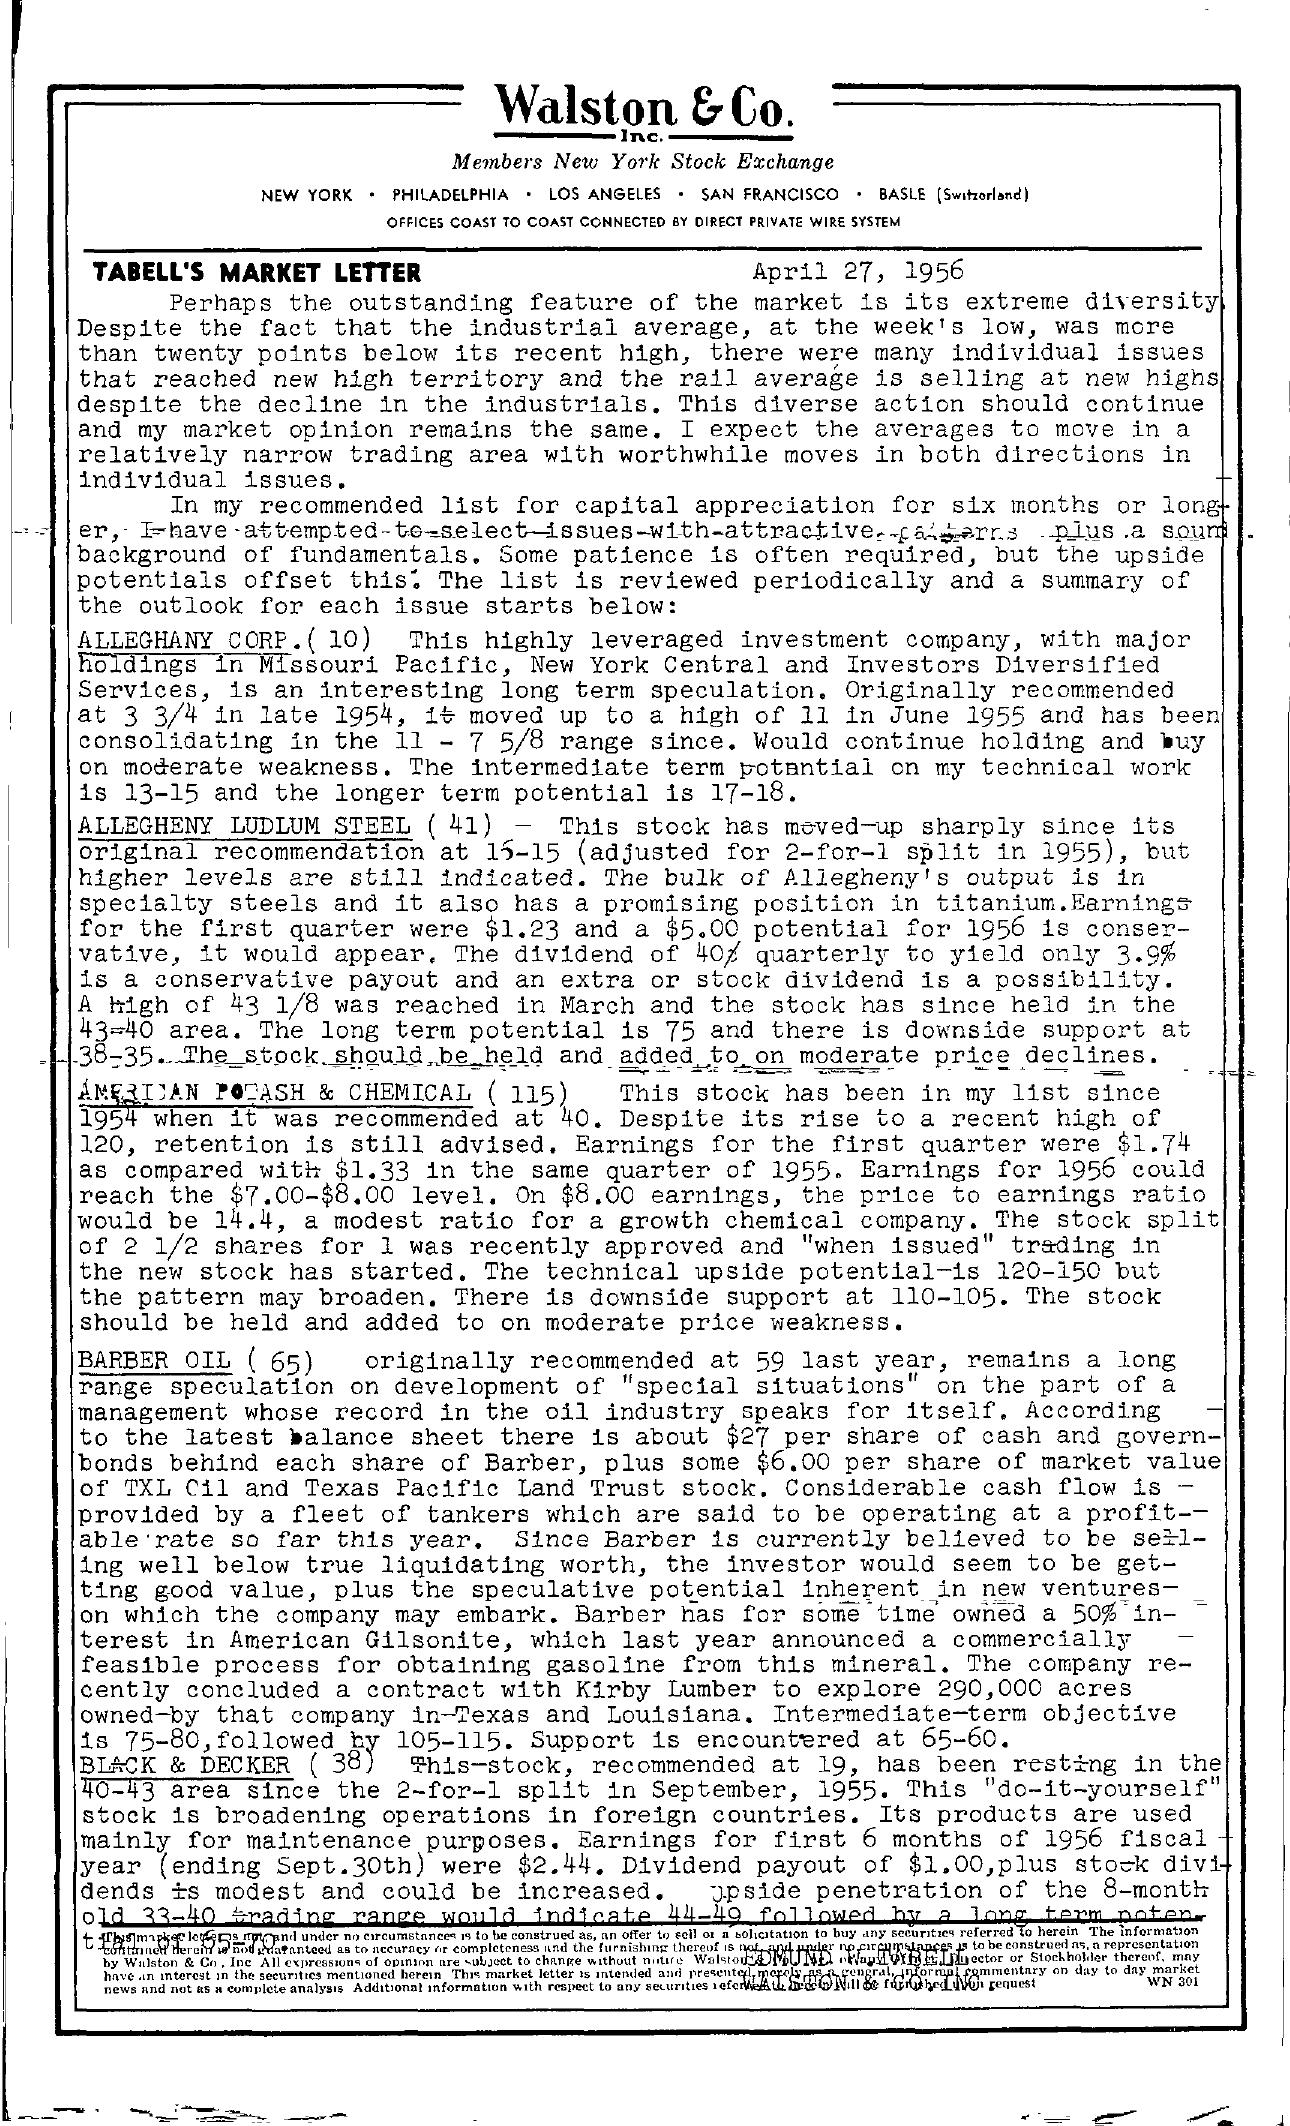 Tabell's Market Letter - April 27, 1956